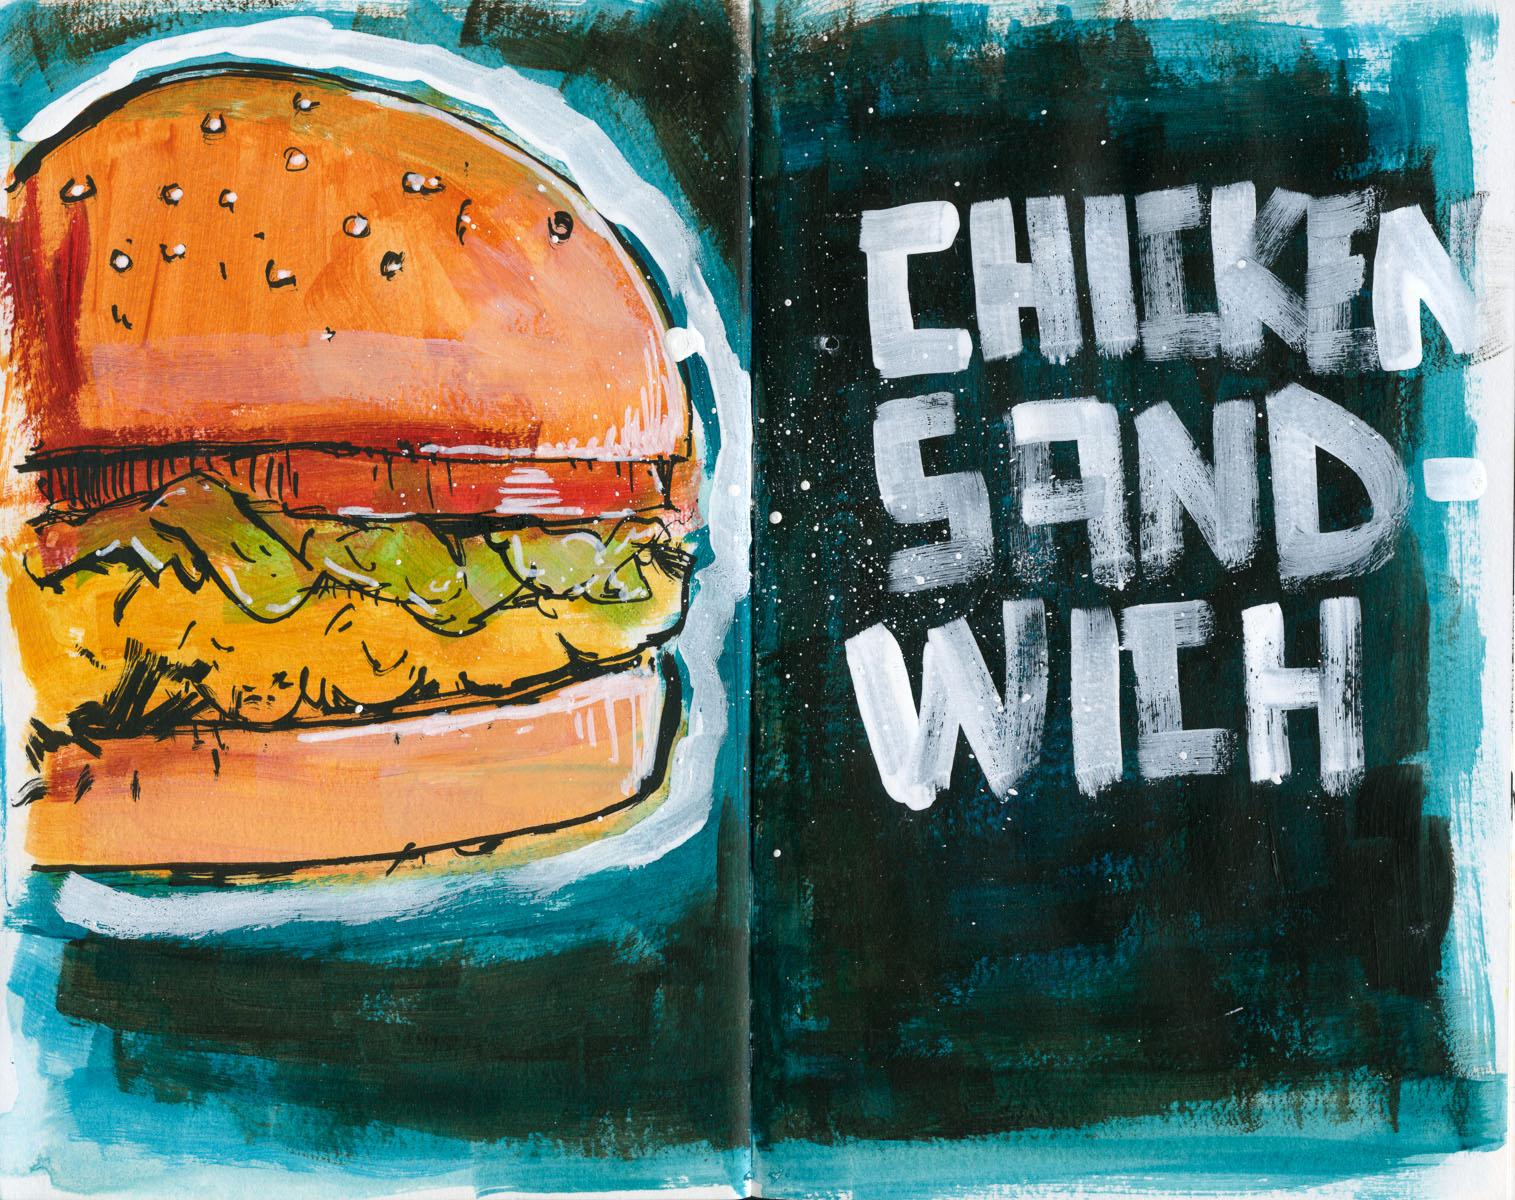 Cannon Pearson–Sketchbook: Chicken Sandwich